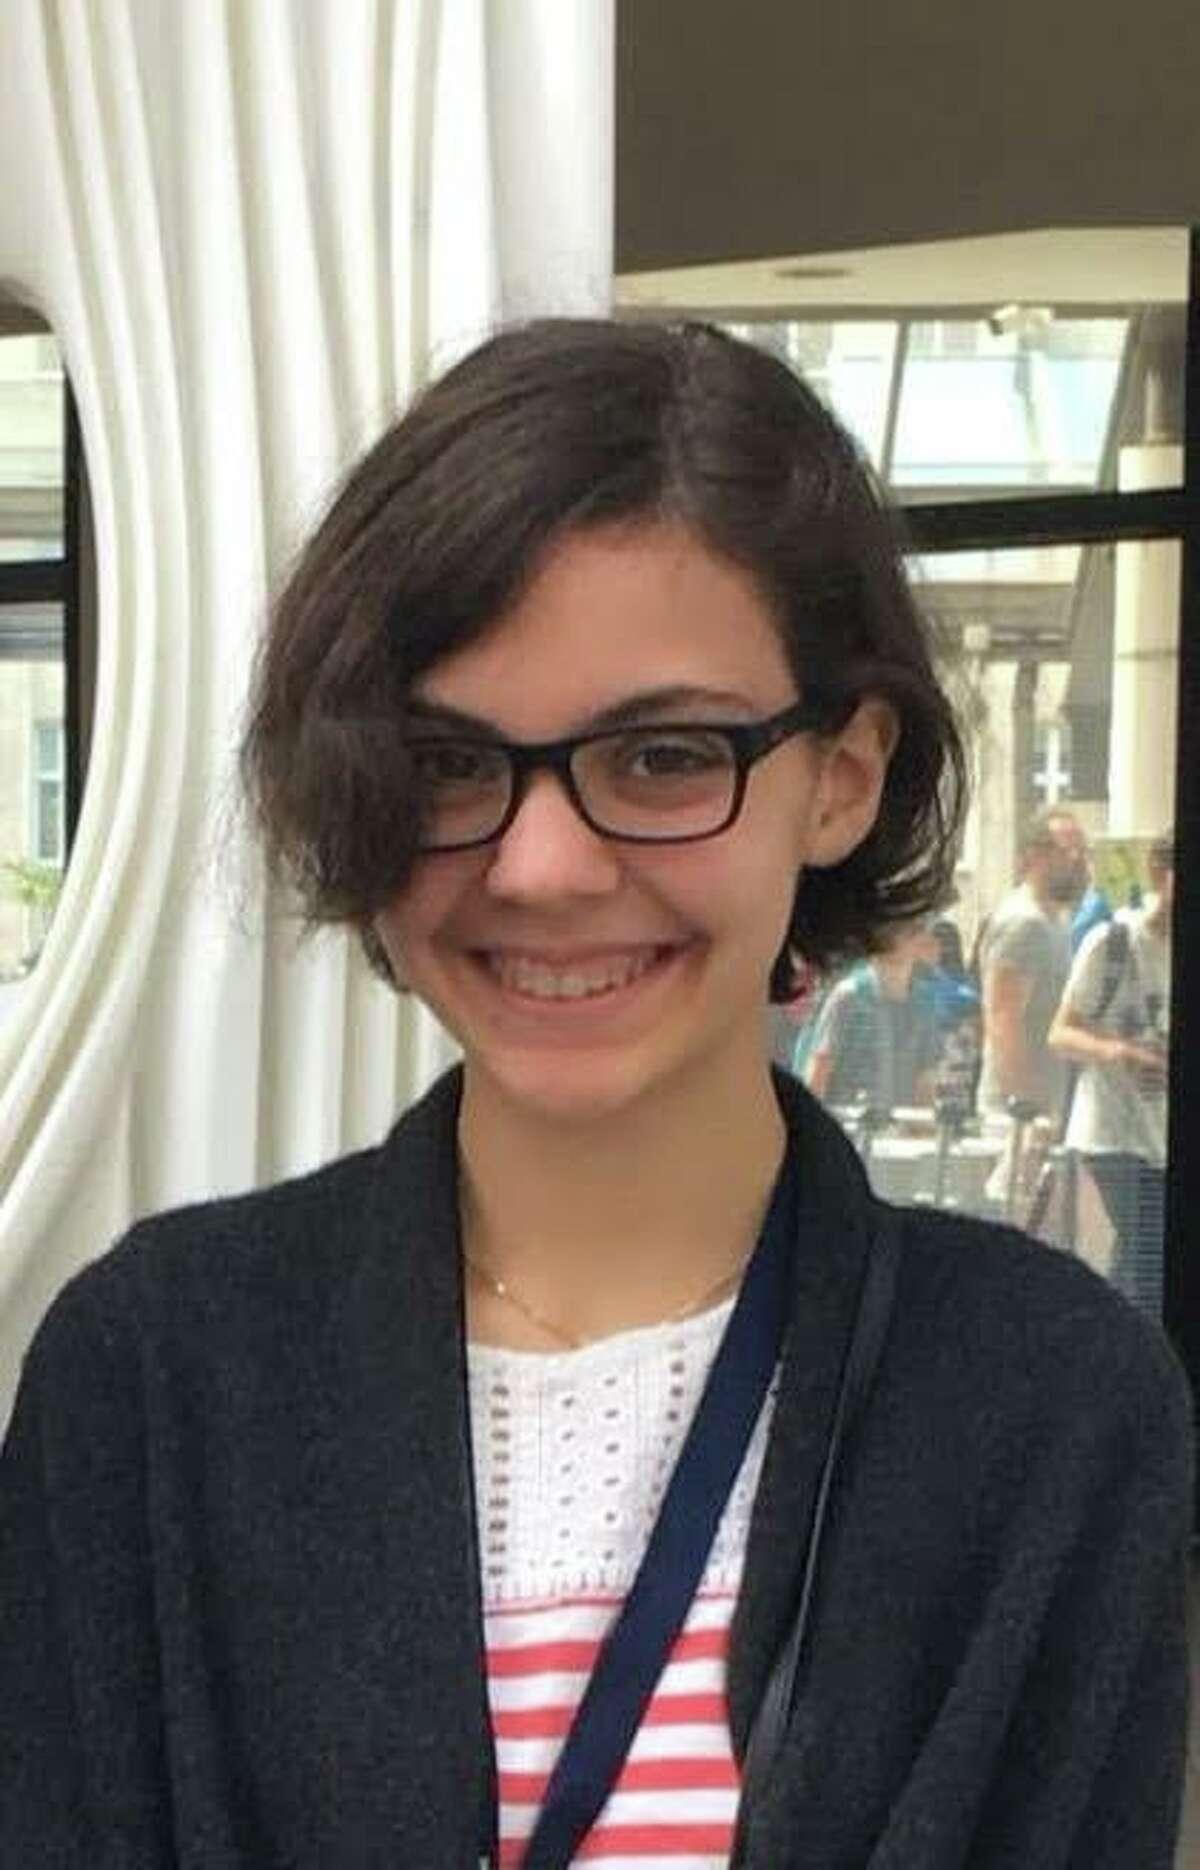 Viktoria Wulff-Andersen is a junior and student journalist at Danbury High School.